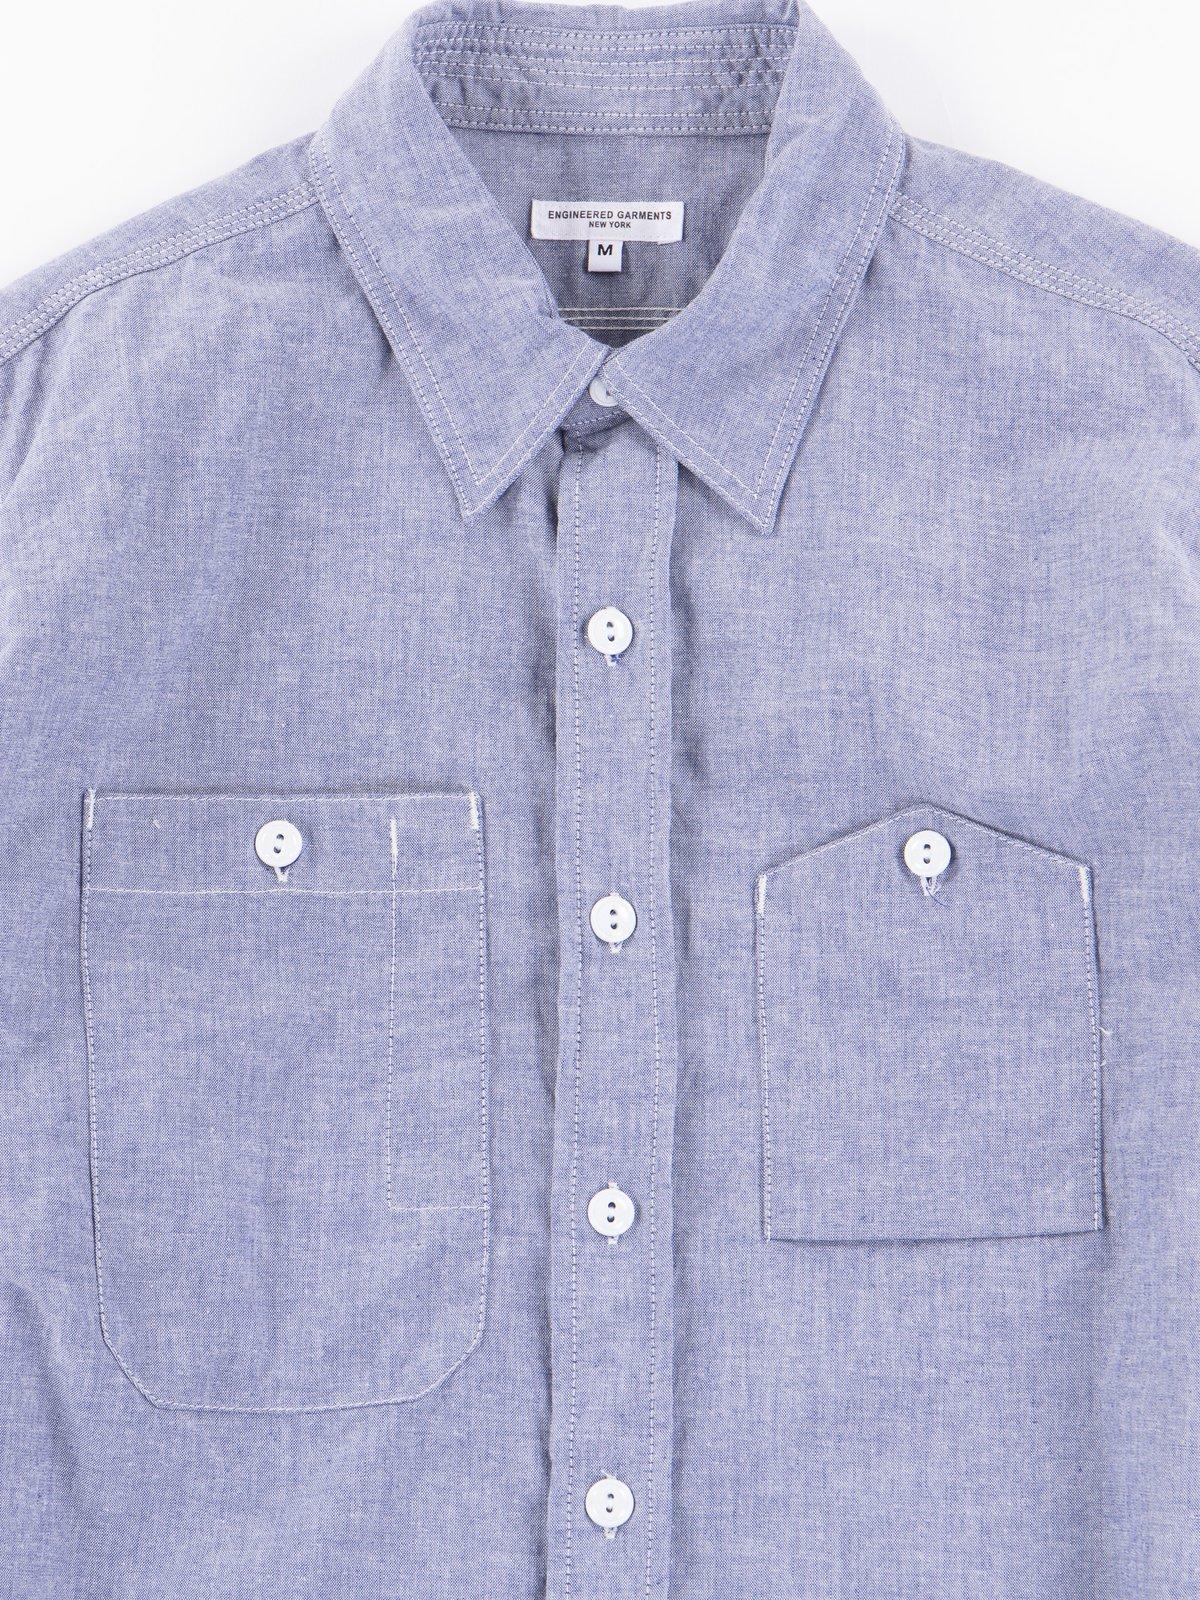 Light Blue Light Weight Cotton Chambray Work Shirt - Image 2